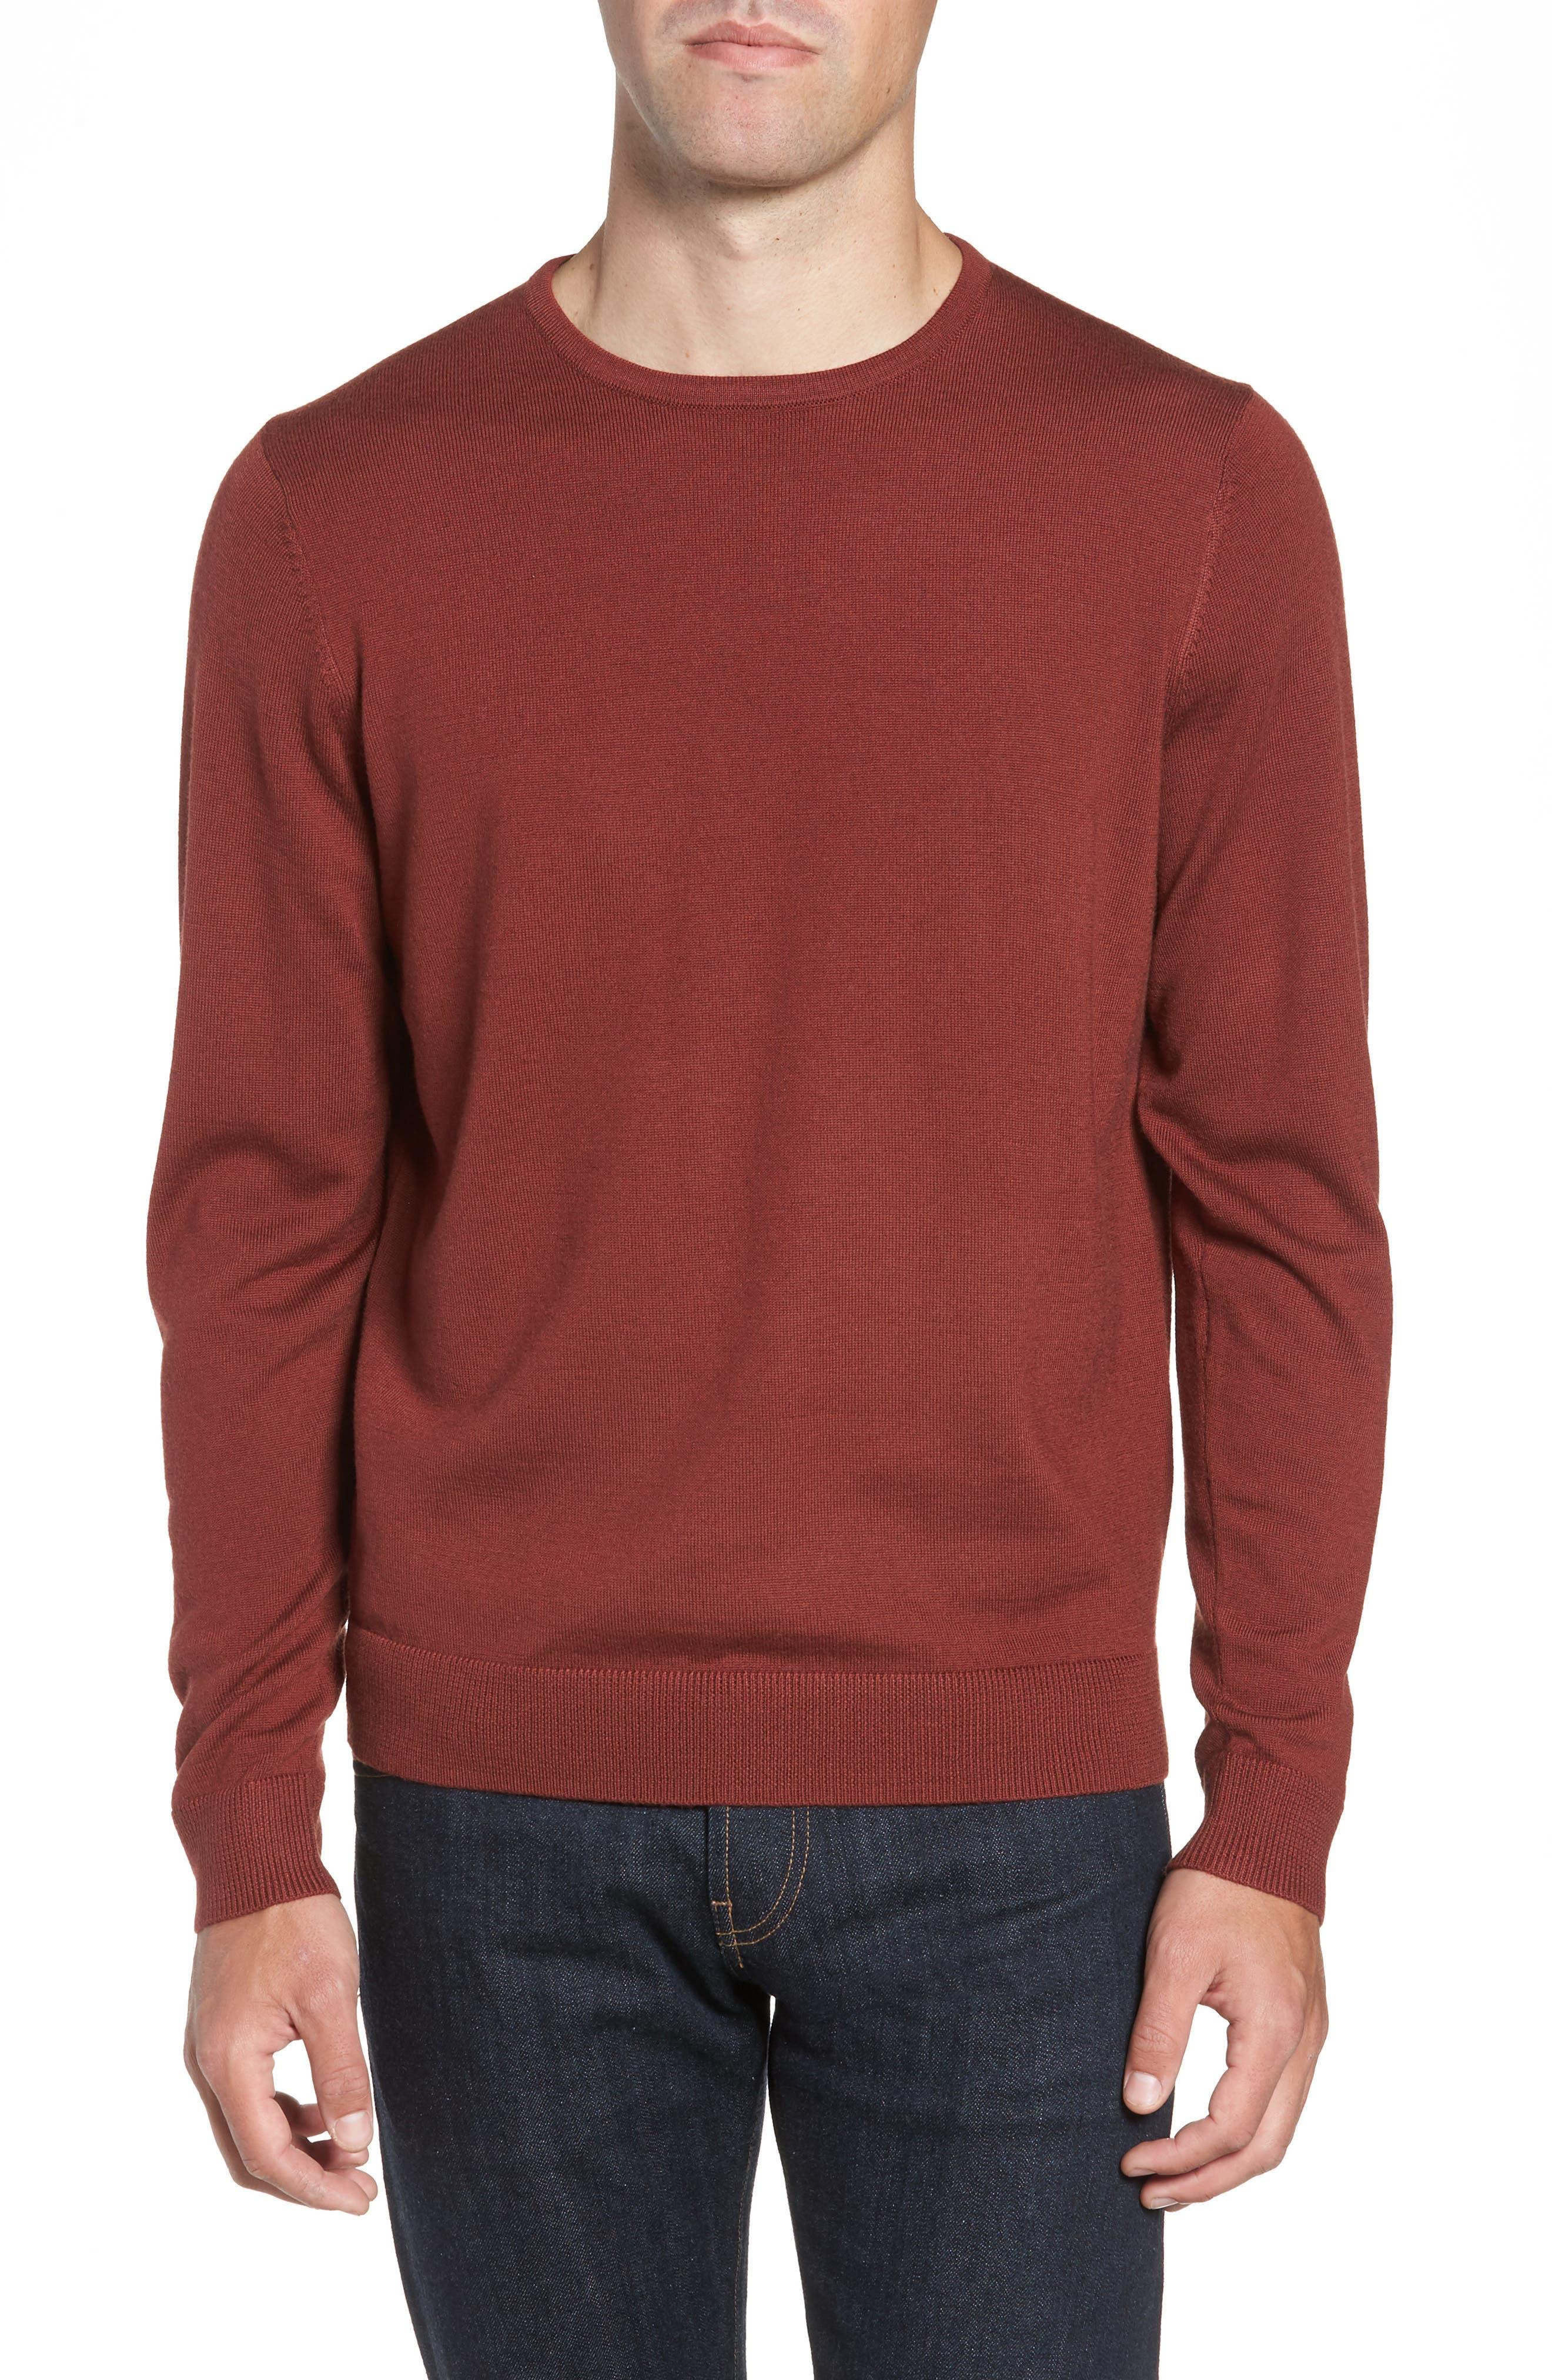 Nordstrom Shop Crewneck Merino Wool Sweater, Brown